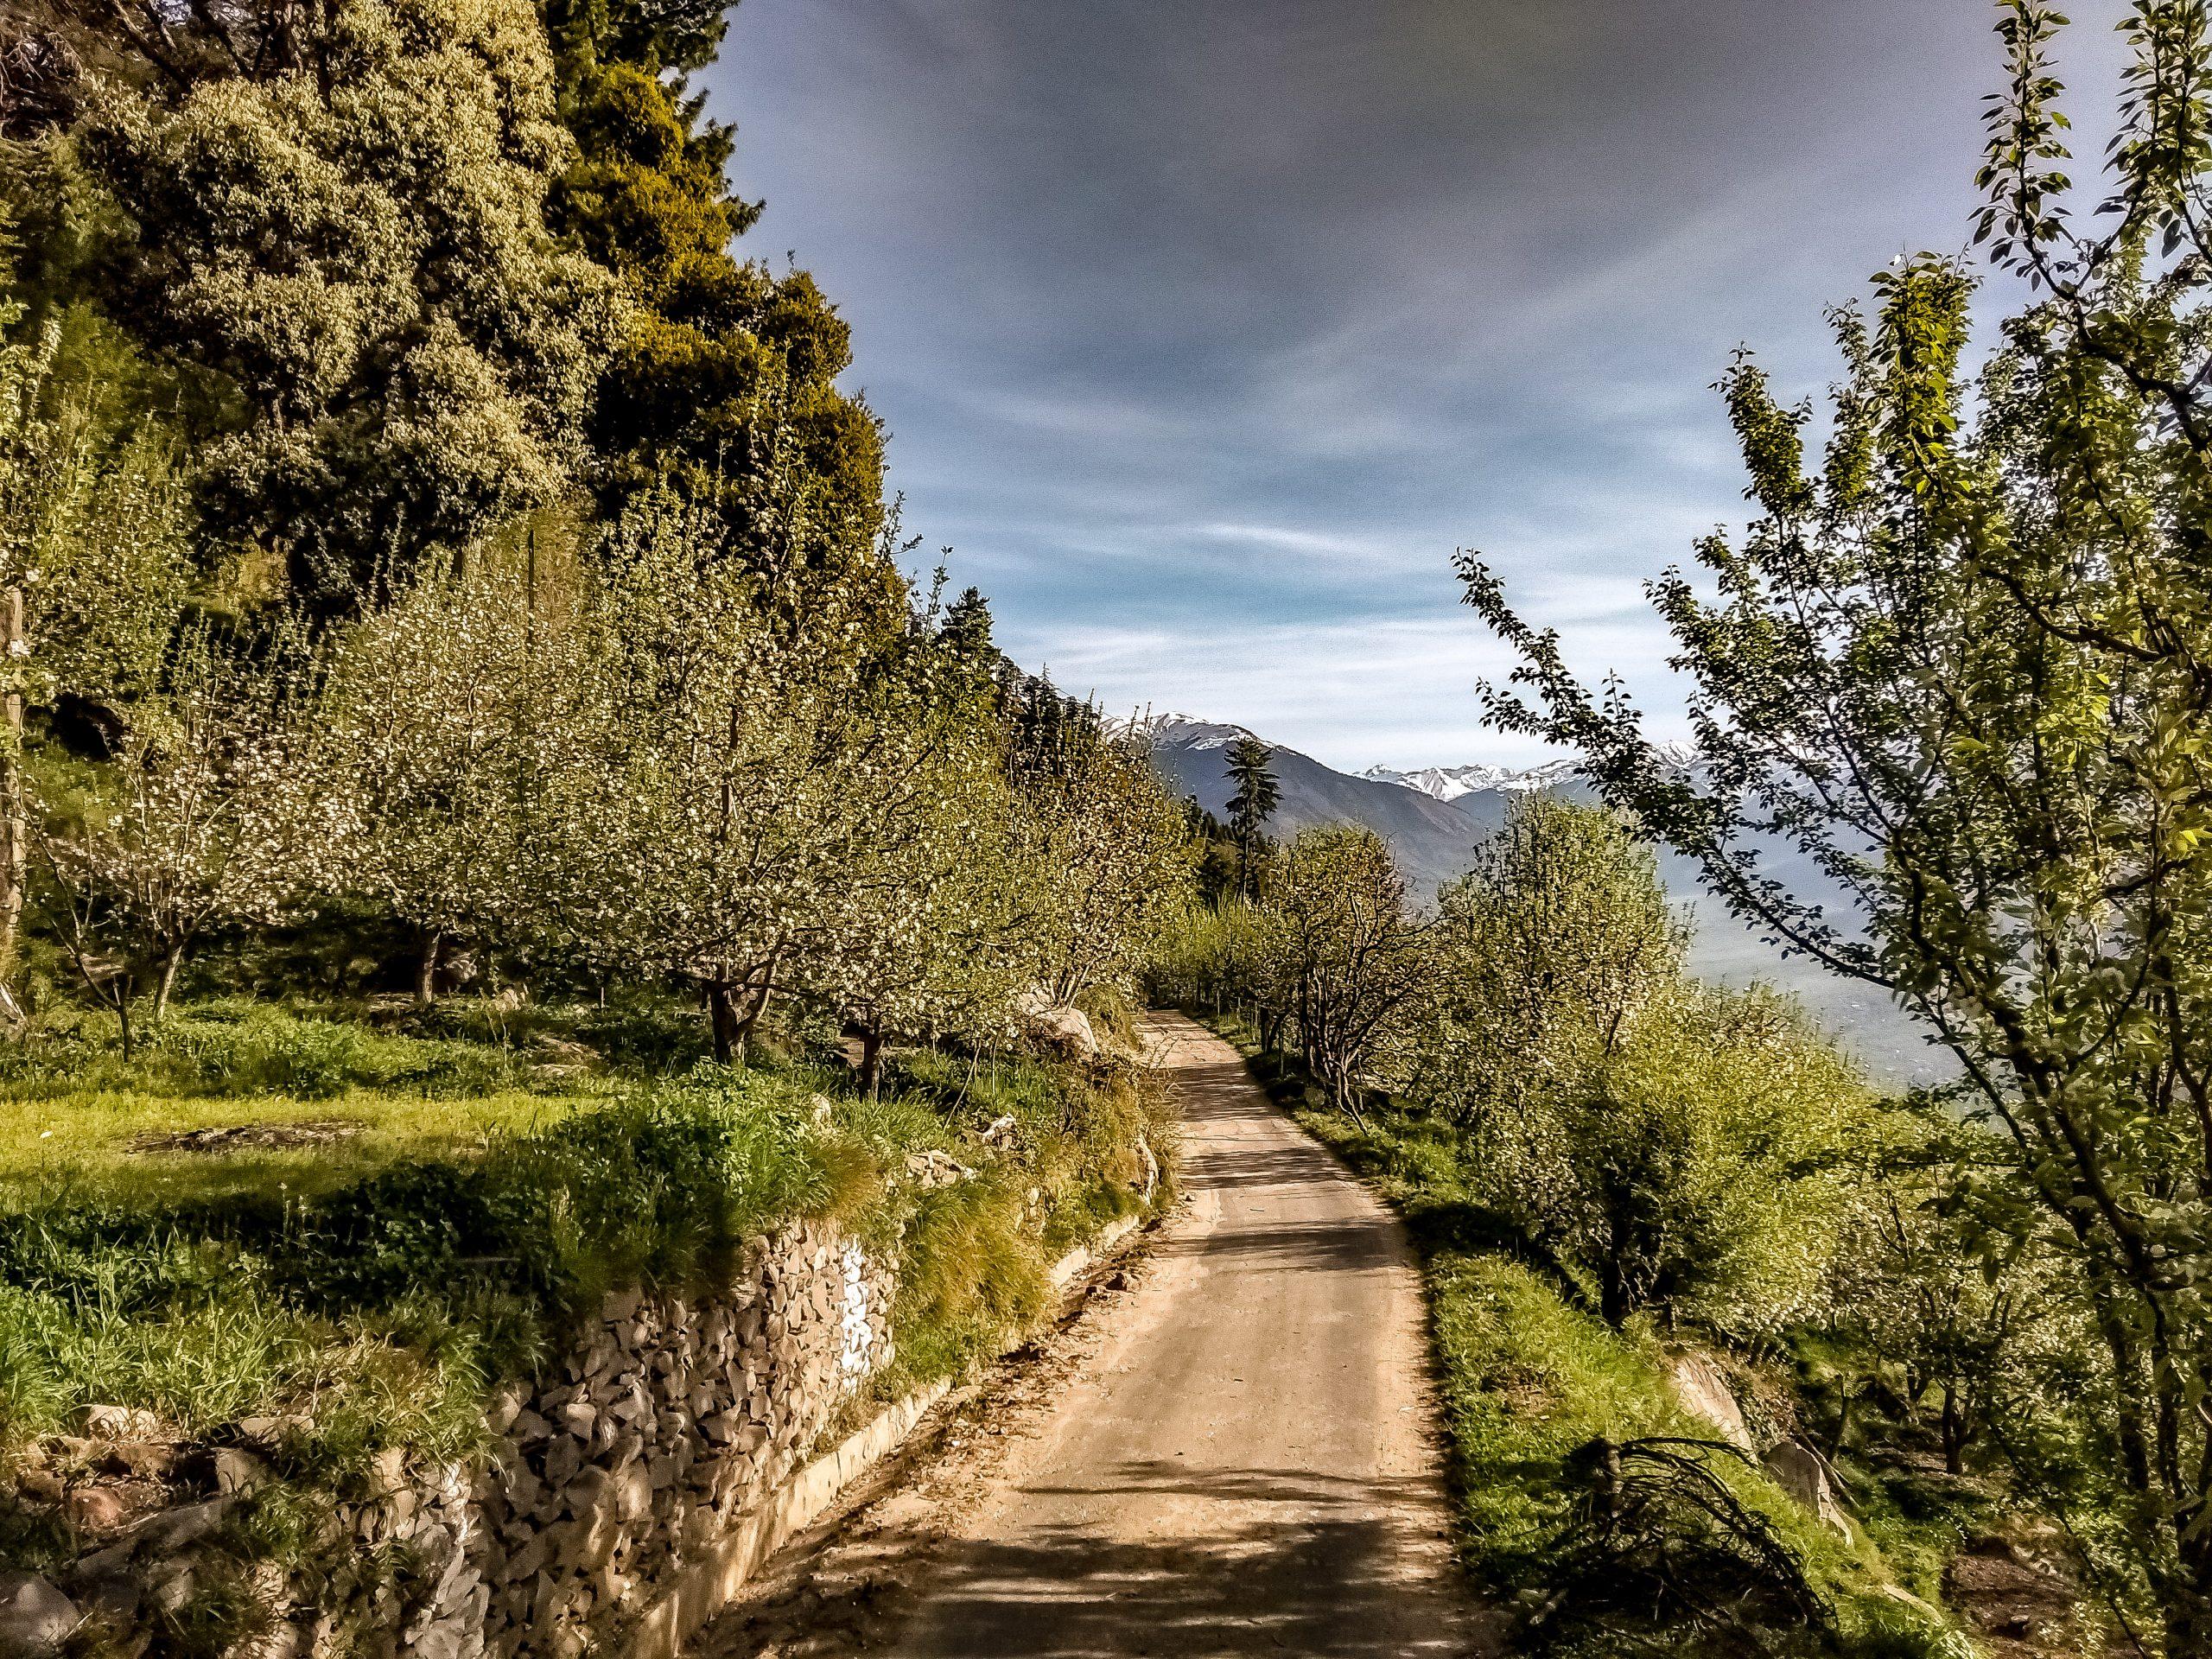 Roads of Manali